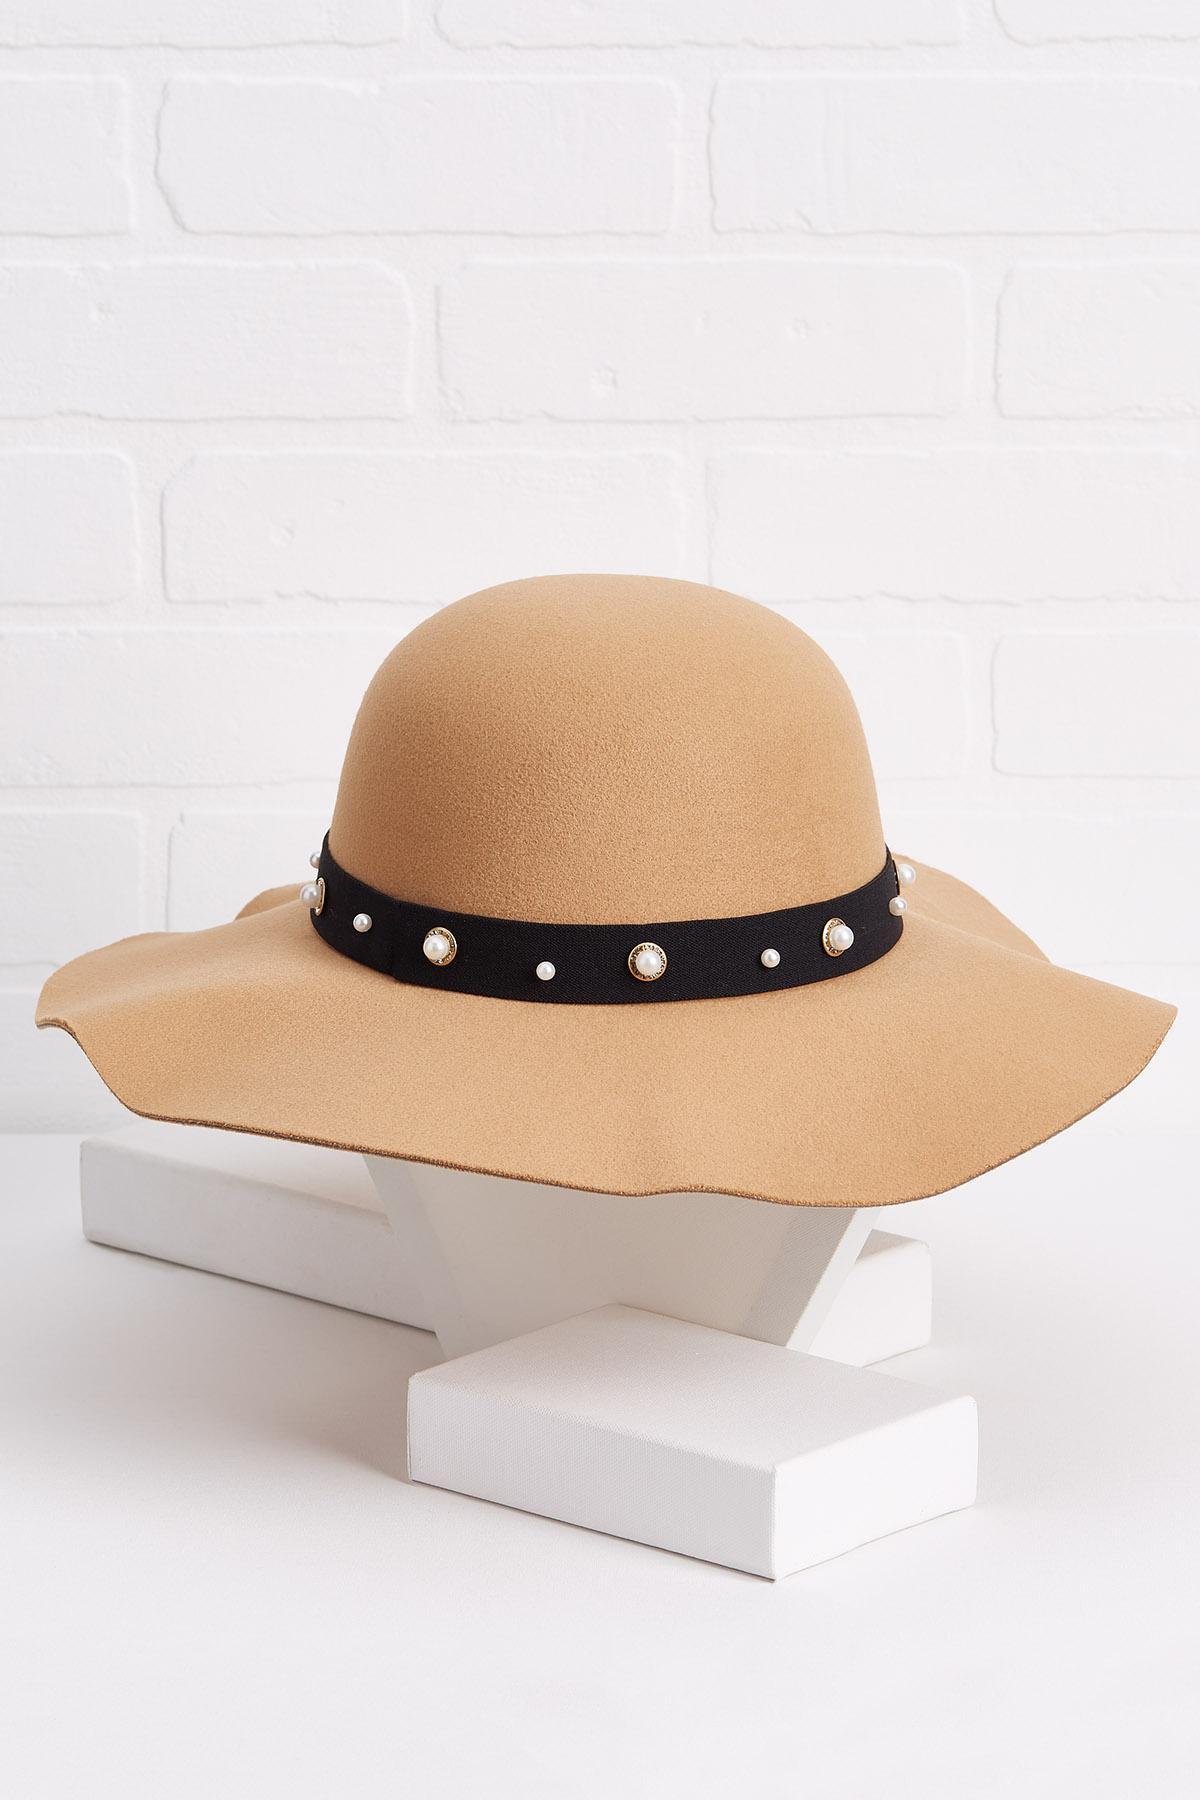 Glamping Floppy Hat